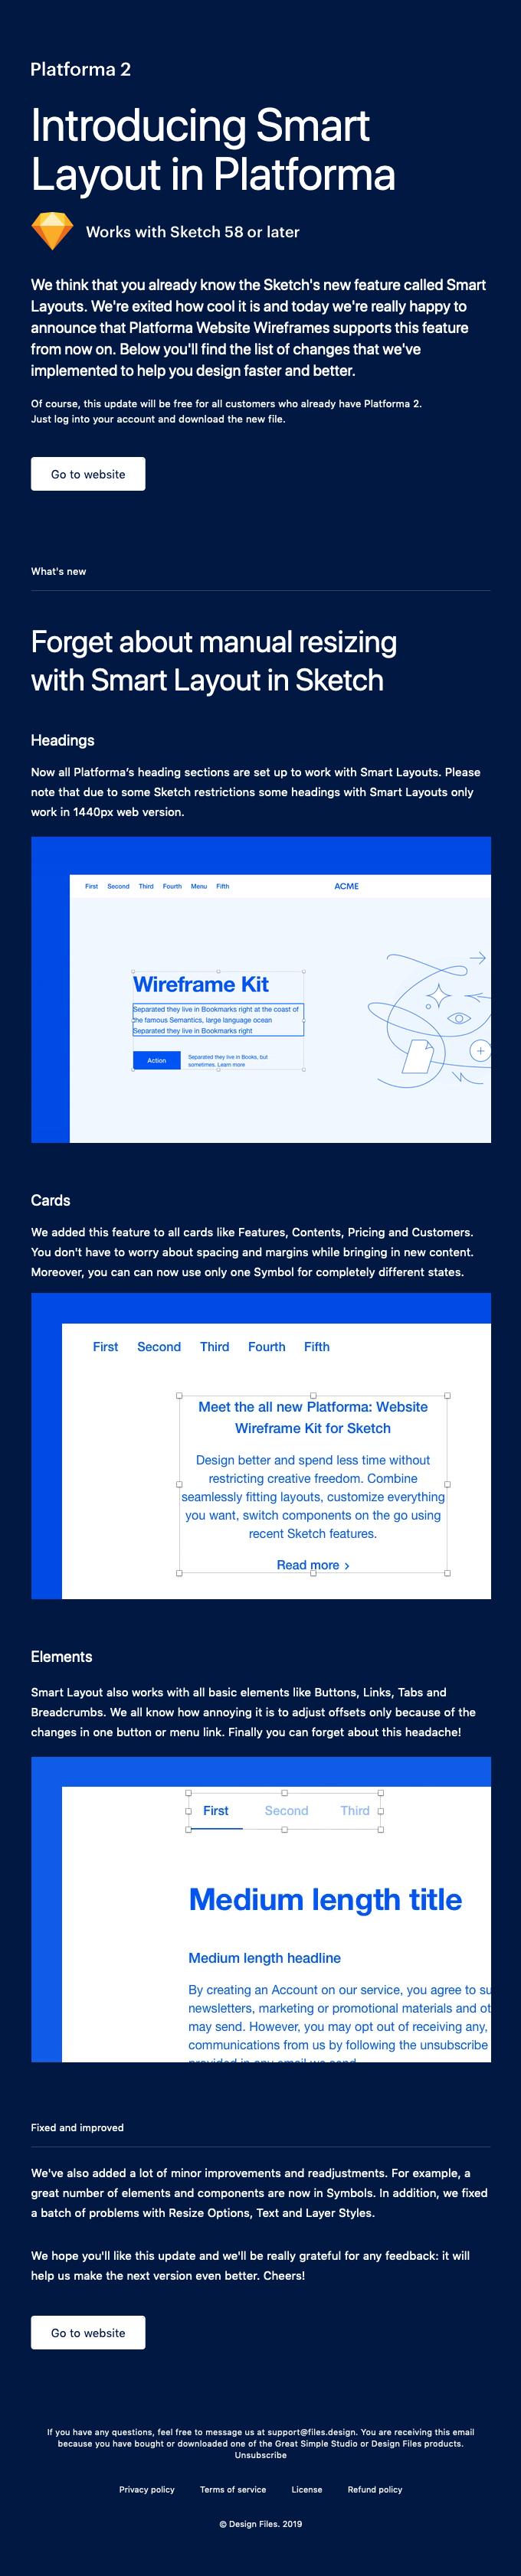 New: Smart Layouts in Platforma Website Wireframes